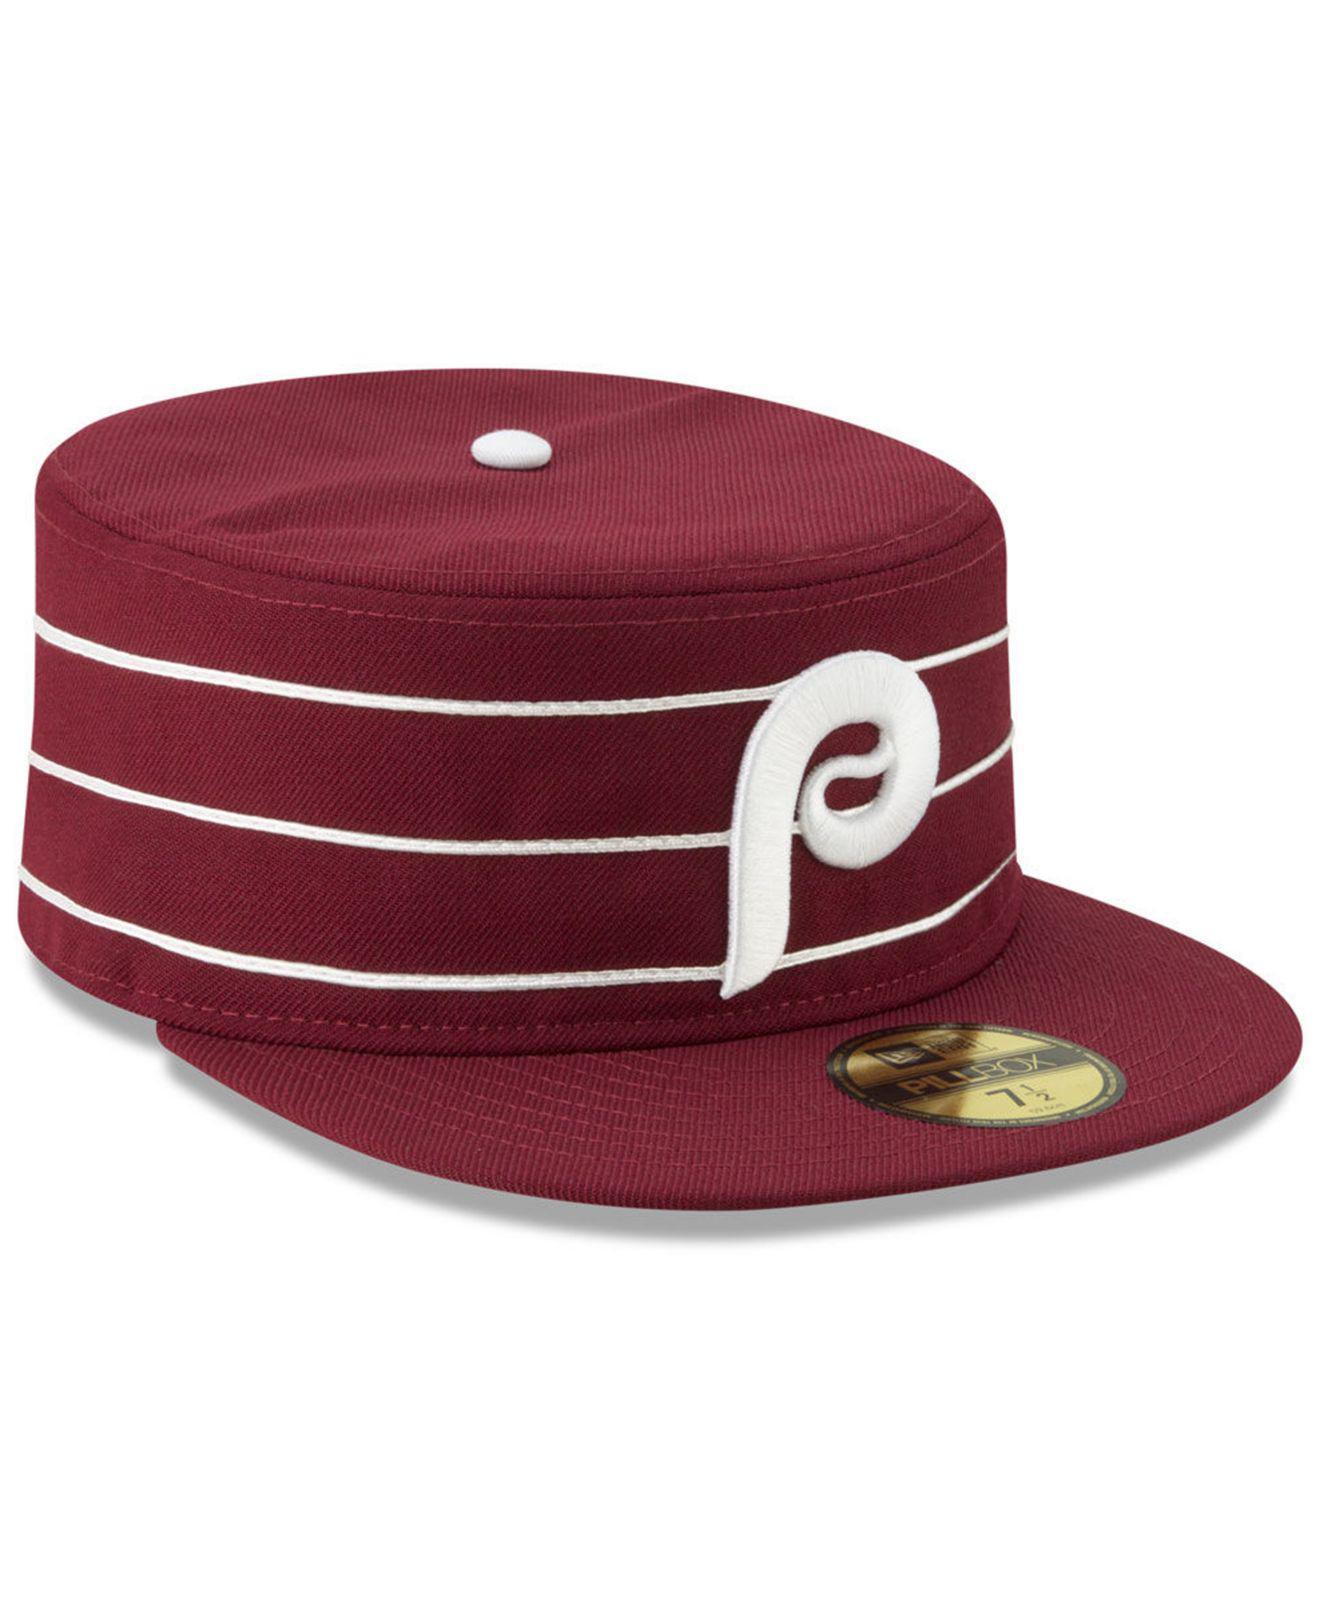 new concept 52cf3 b016a ... ebay philadelphia phillies pillbox 59fifty fitted cap for men lyst.  view fullscreen ff851 39fc3